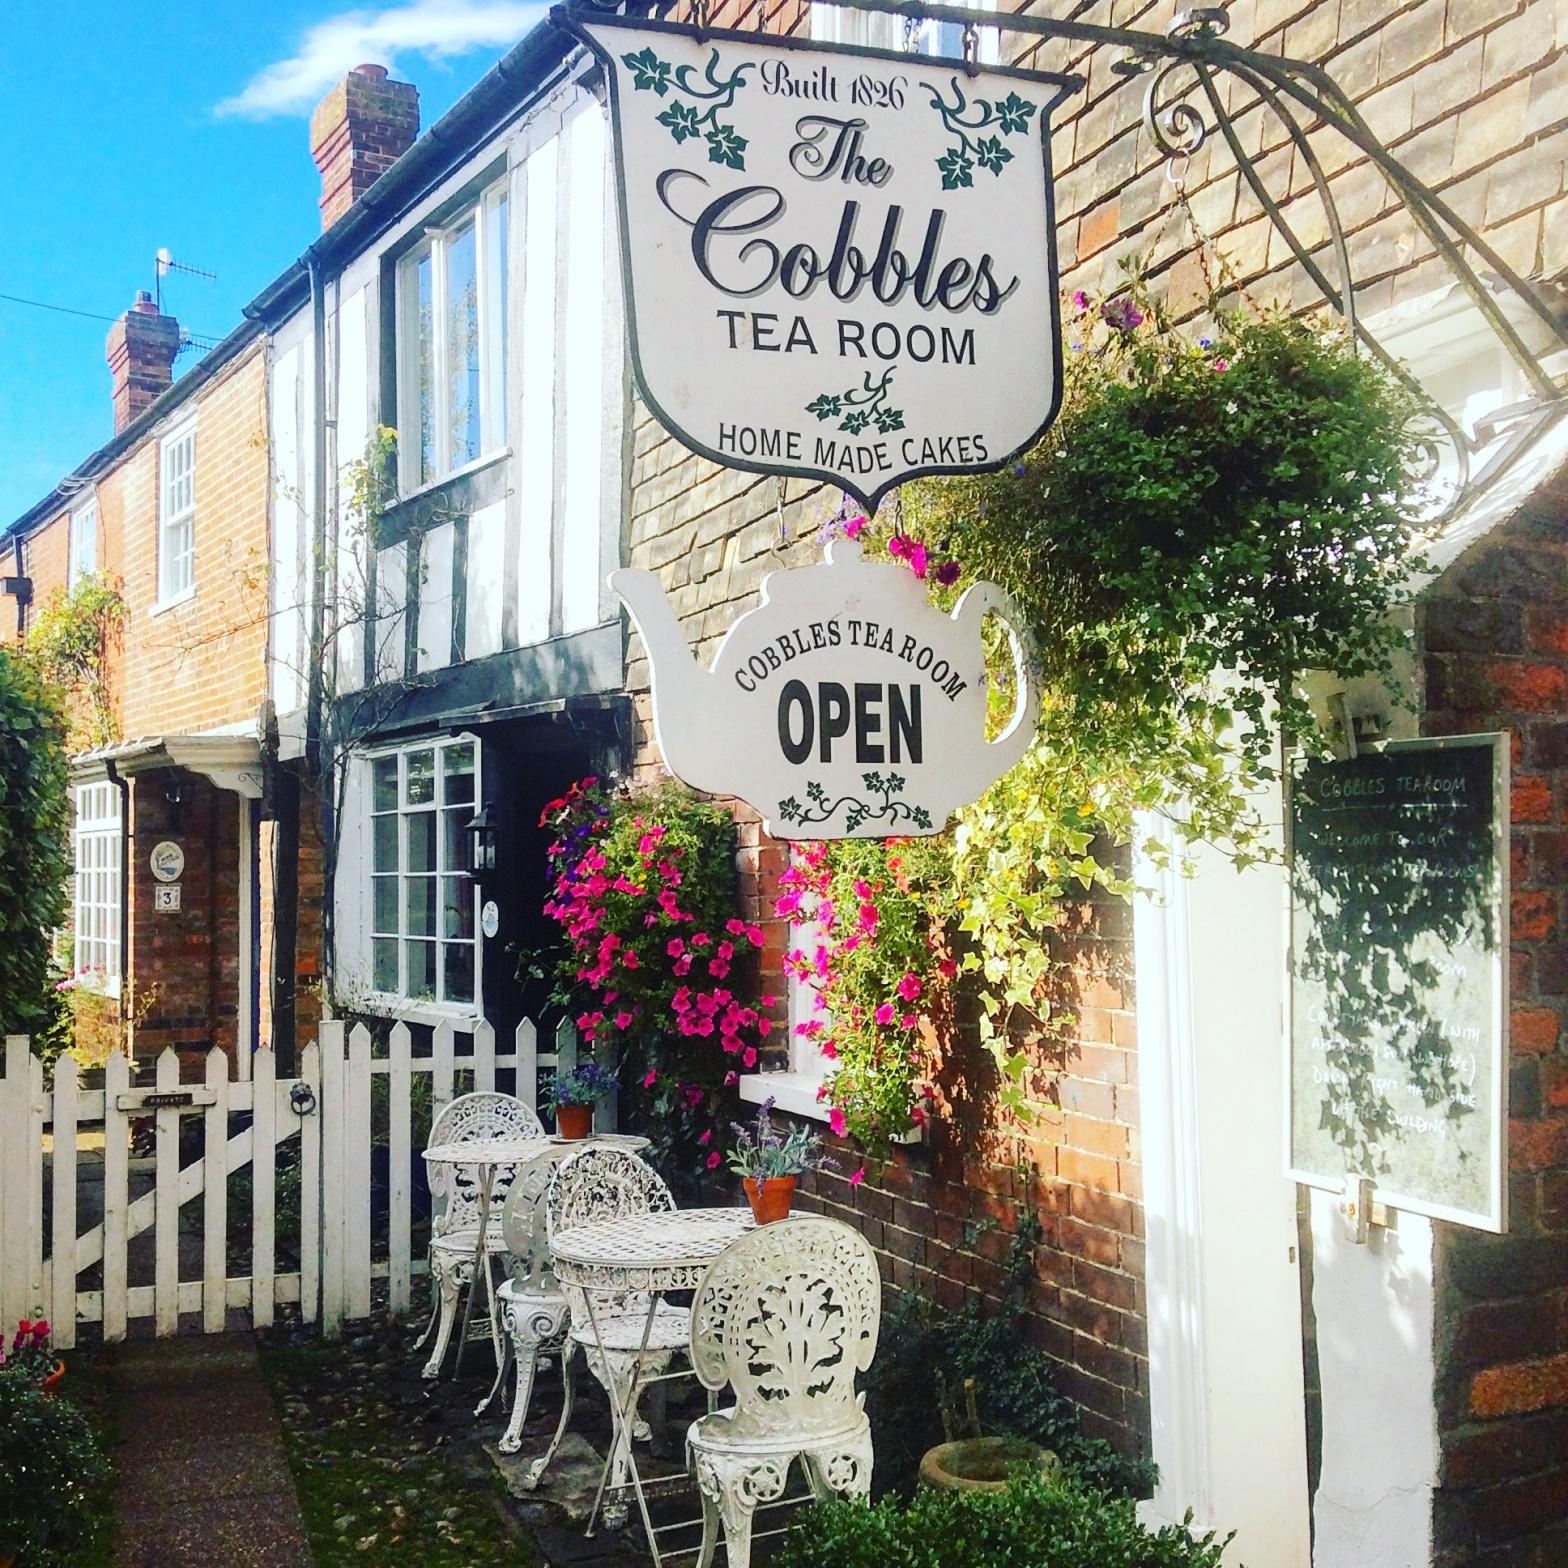 The Cobbles Tea Room, Rye